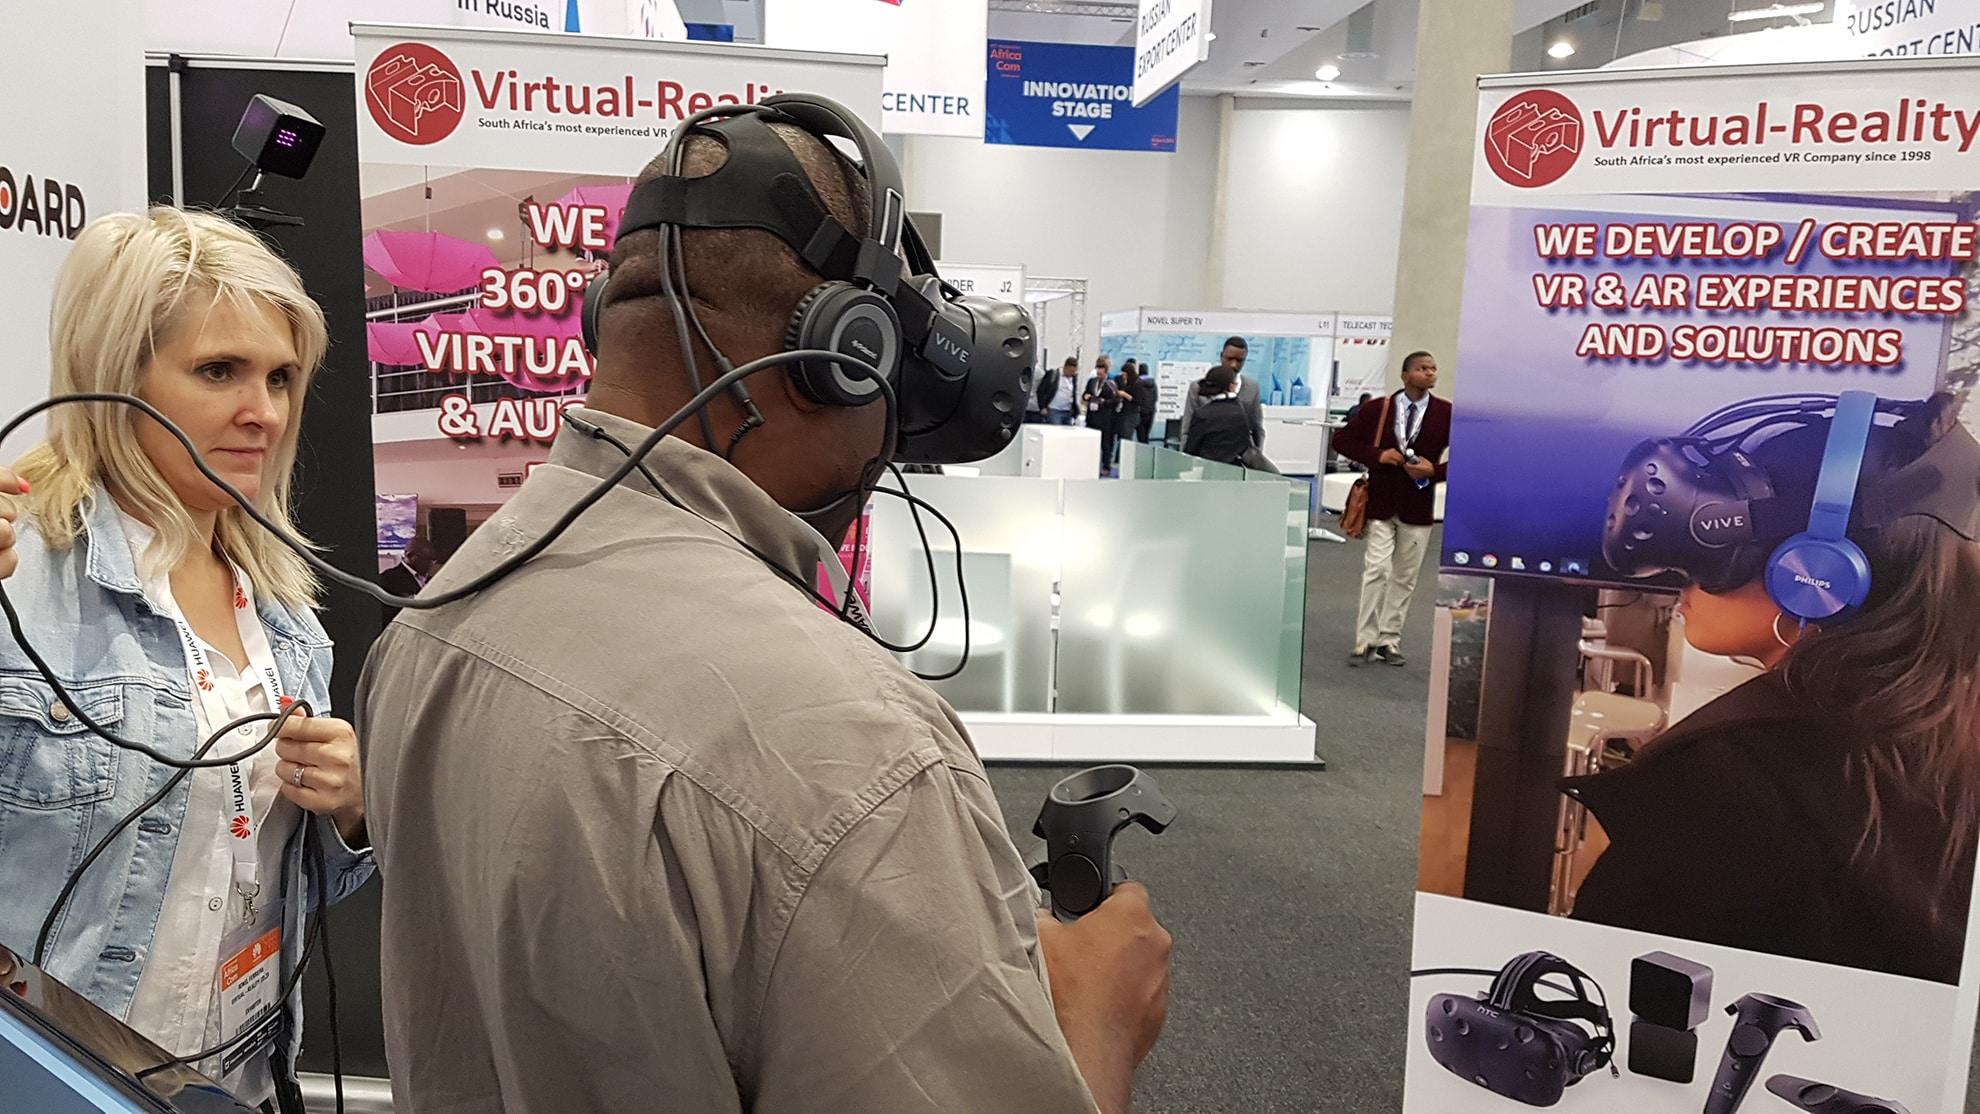 virtual-reality-cape-town